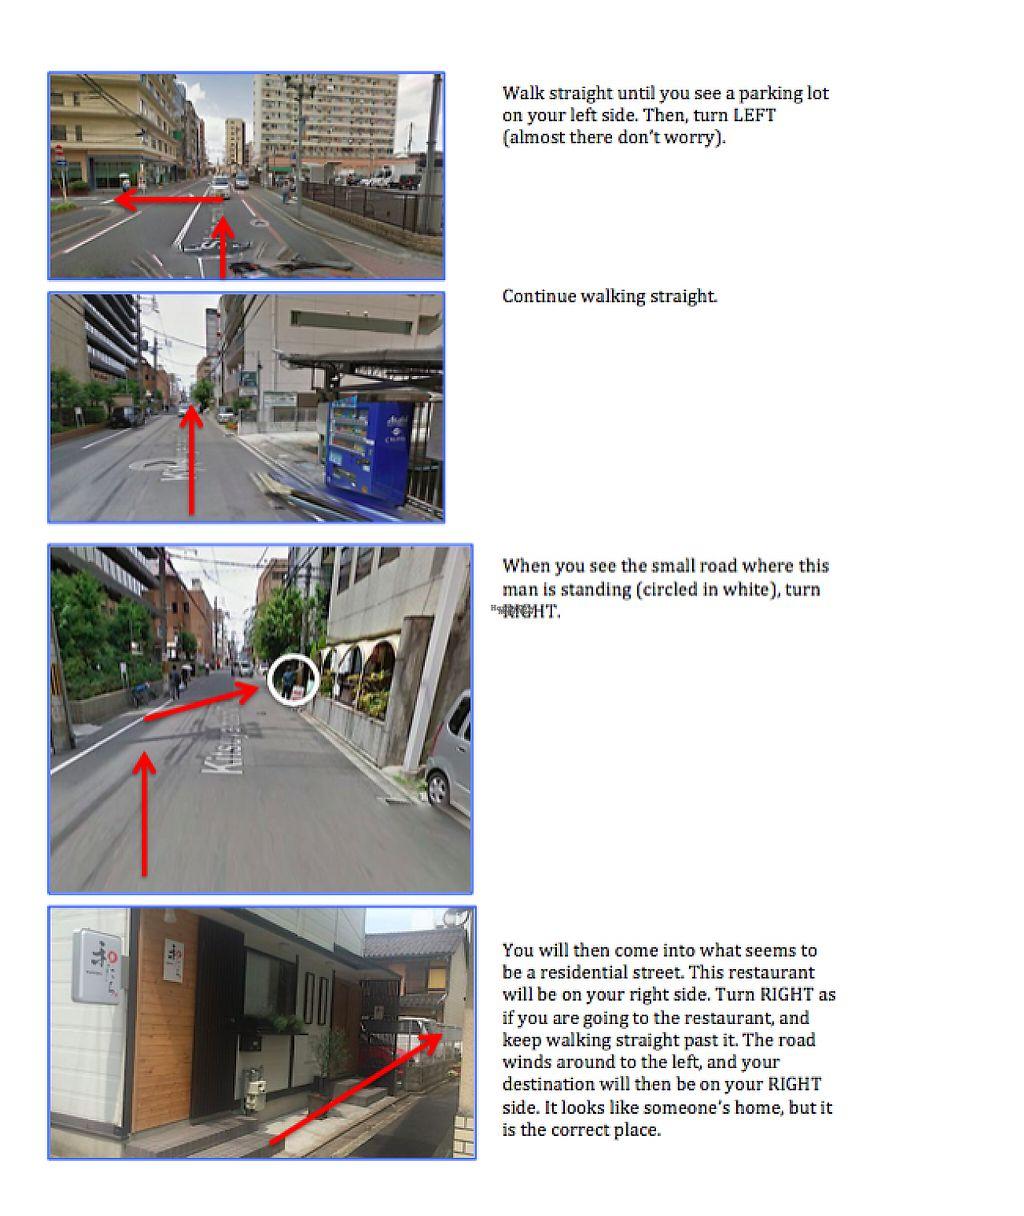 "Photo of Organic House Salute  by <a href=""/members/profile/alexanderamanda88"">alexanderamanda88</a> <br/>Directions to Organic House Salute from Kyoto Station- page 2 <br/> February 4, 2017  - <a href='/contact/abuse/image/43818/222414'>Report</a>"